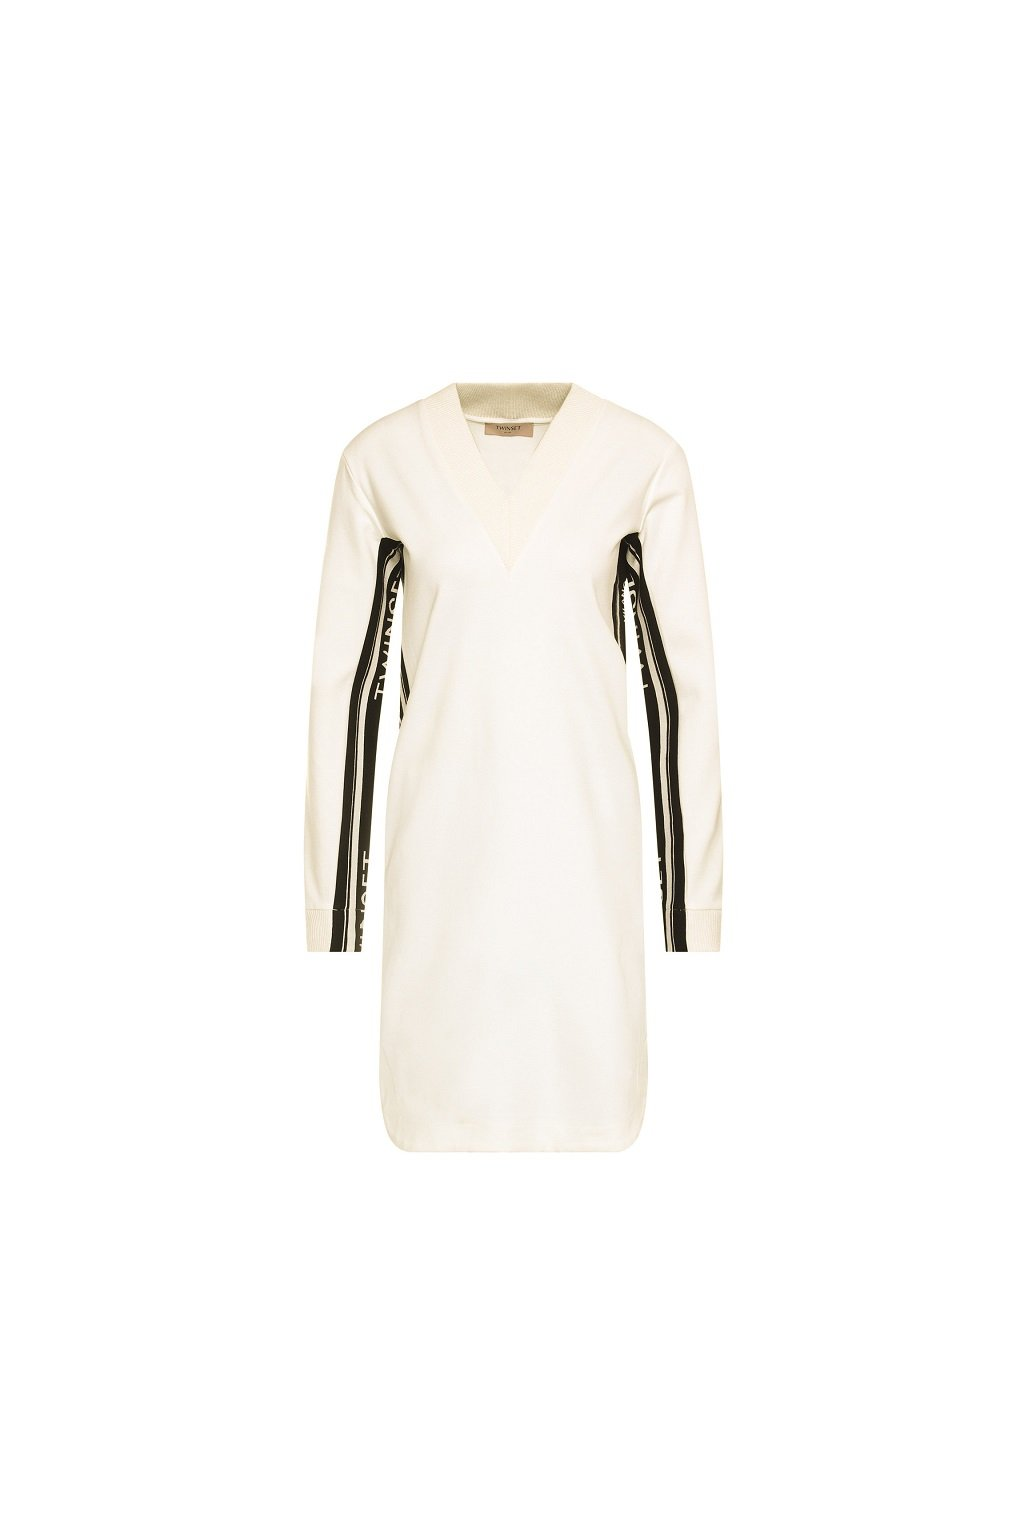 Dámské šaty Twinset logo 201TP2073 bílé